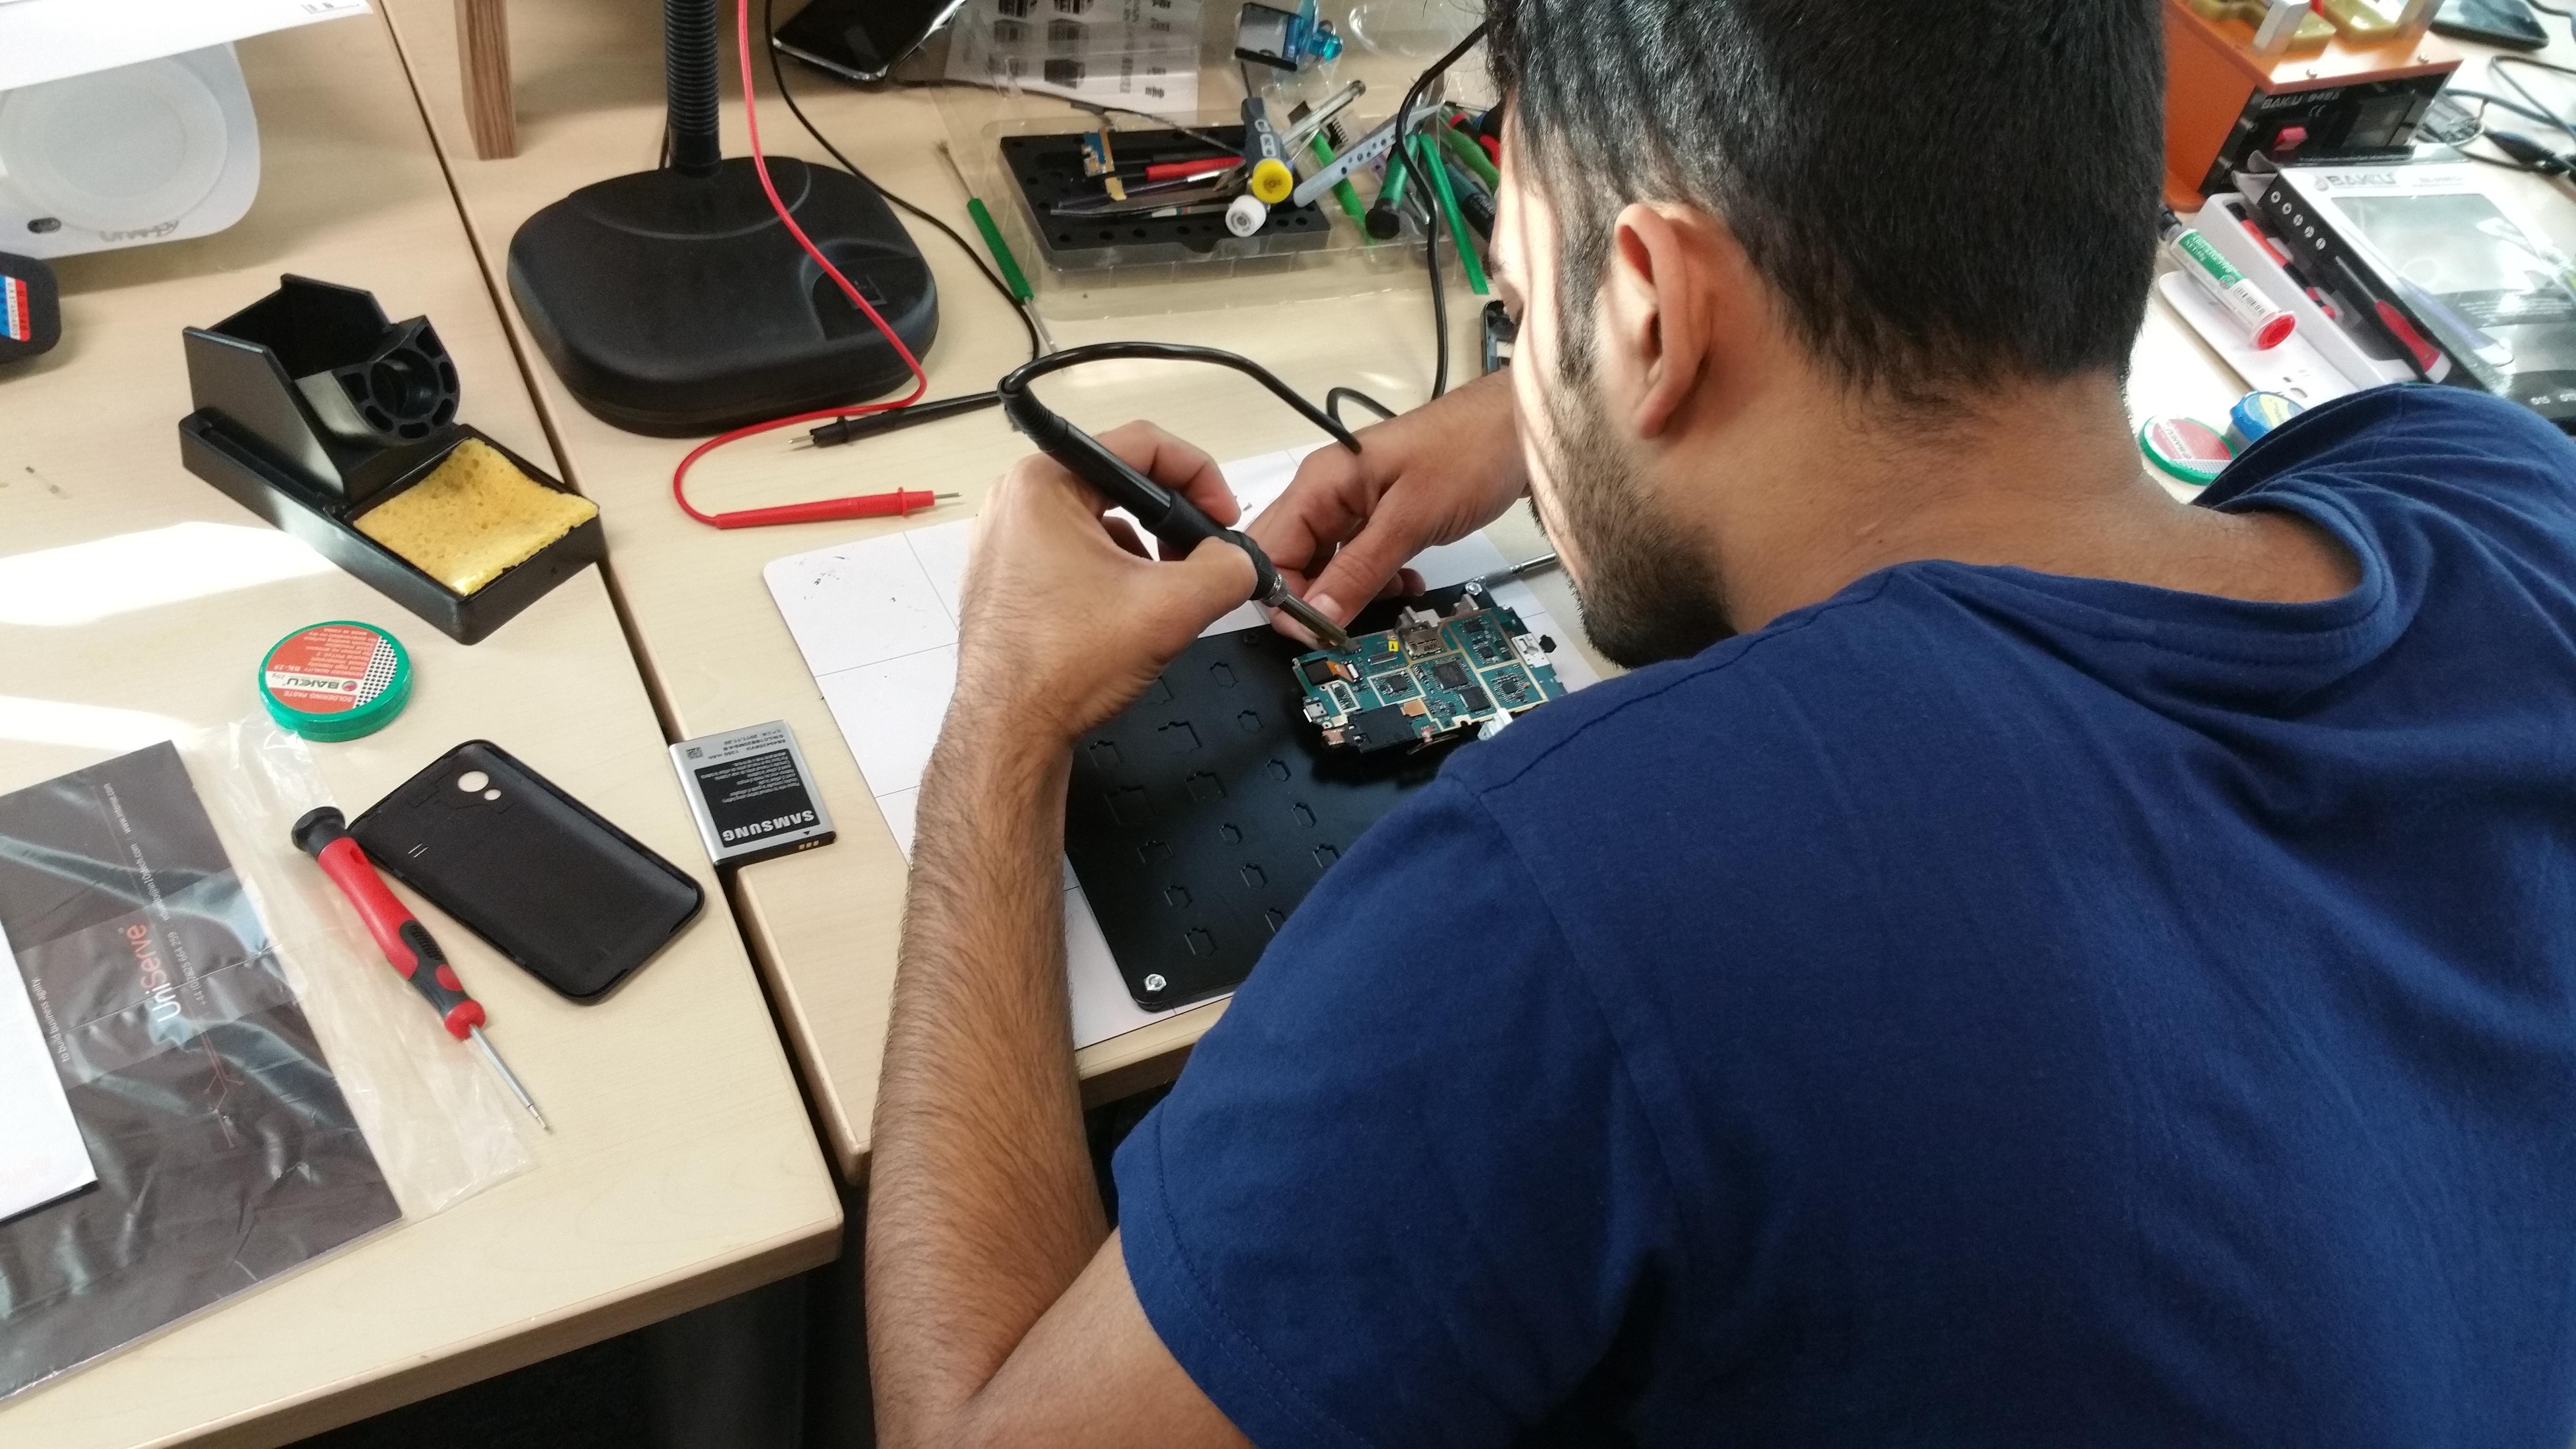 Mobile phone repair course